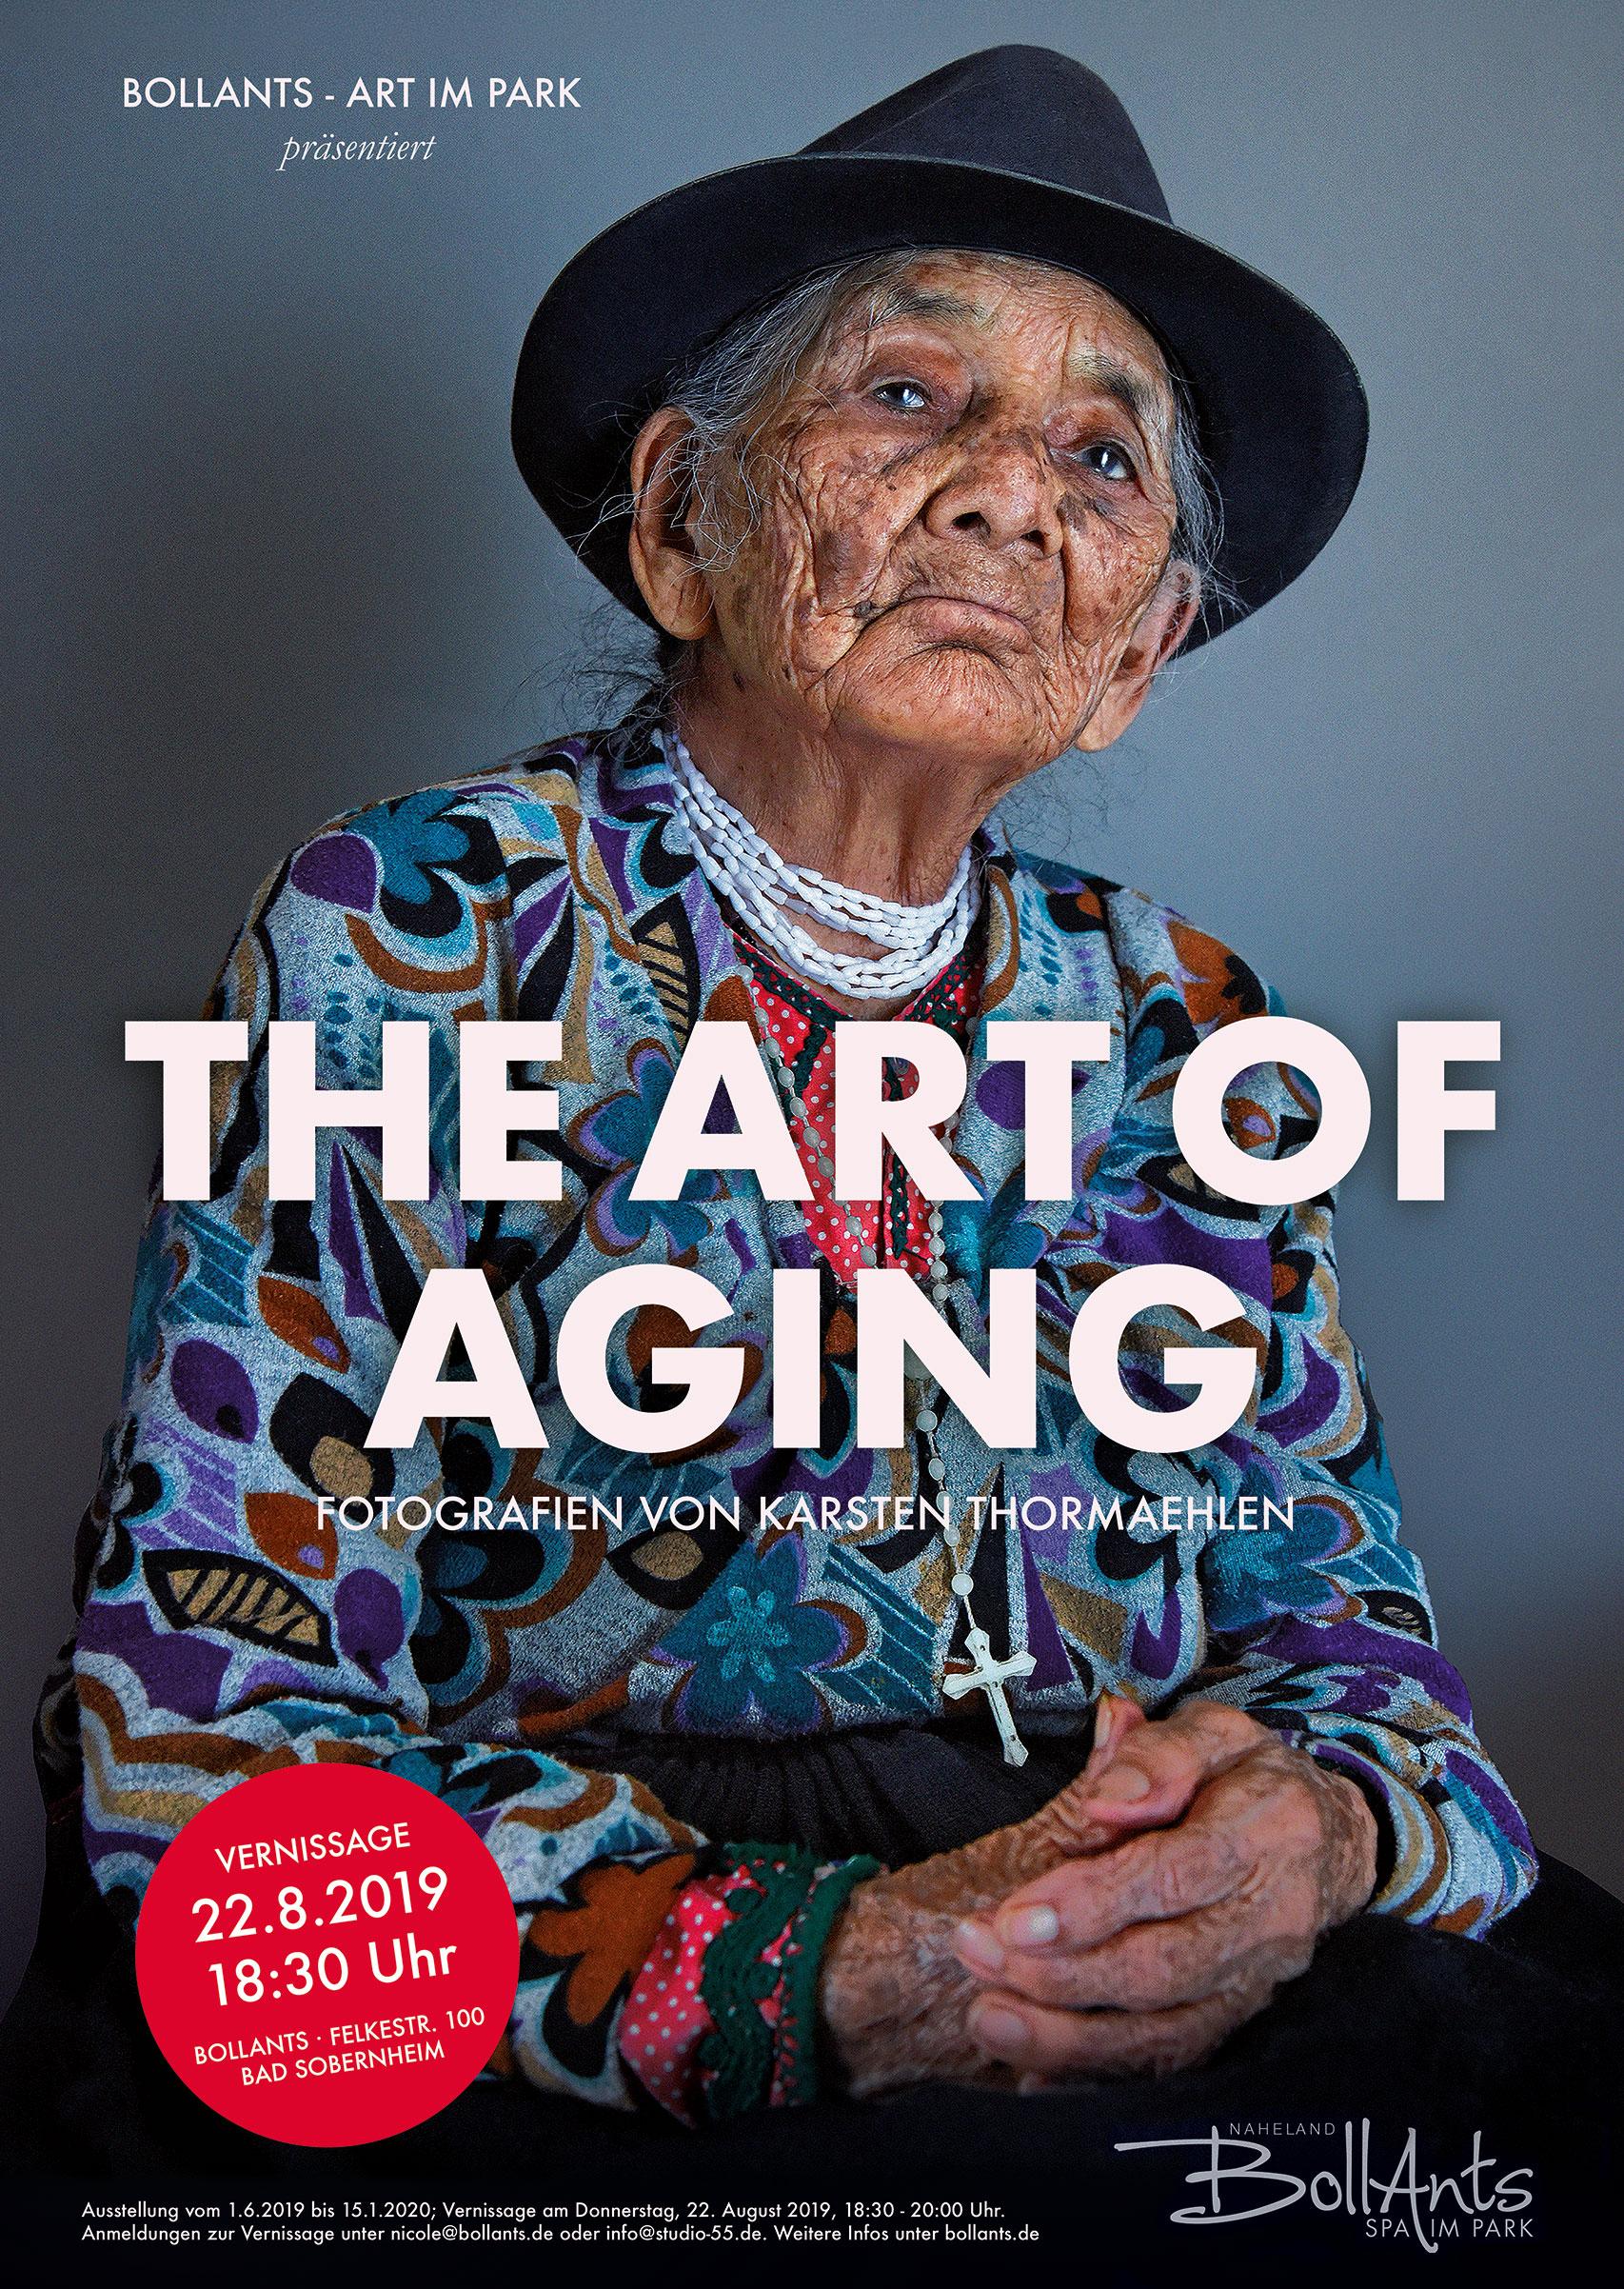 Marìa, 103, aus dem Buch  Aging Gracefully  (dt. Titel:  100 Jahre Lebensglück ), Ecuador, 2015